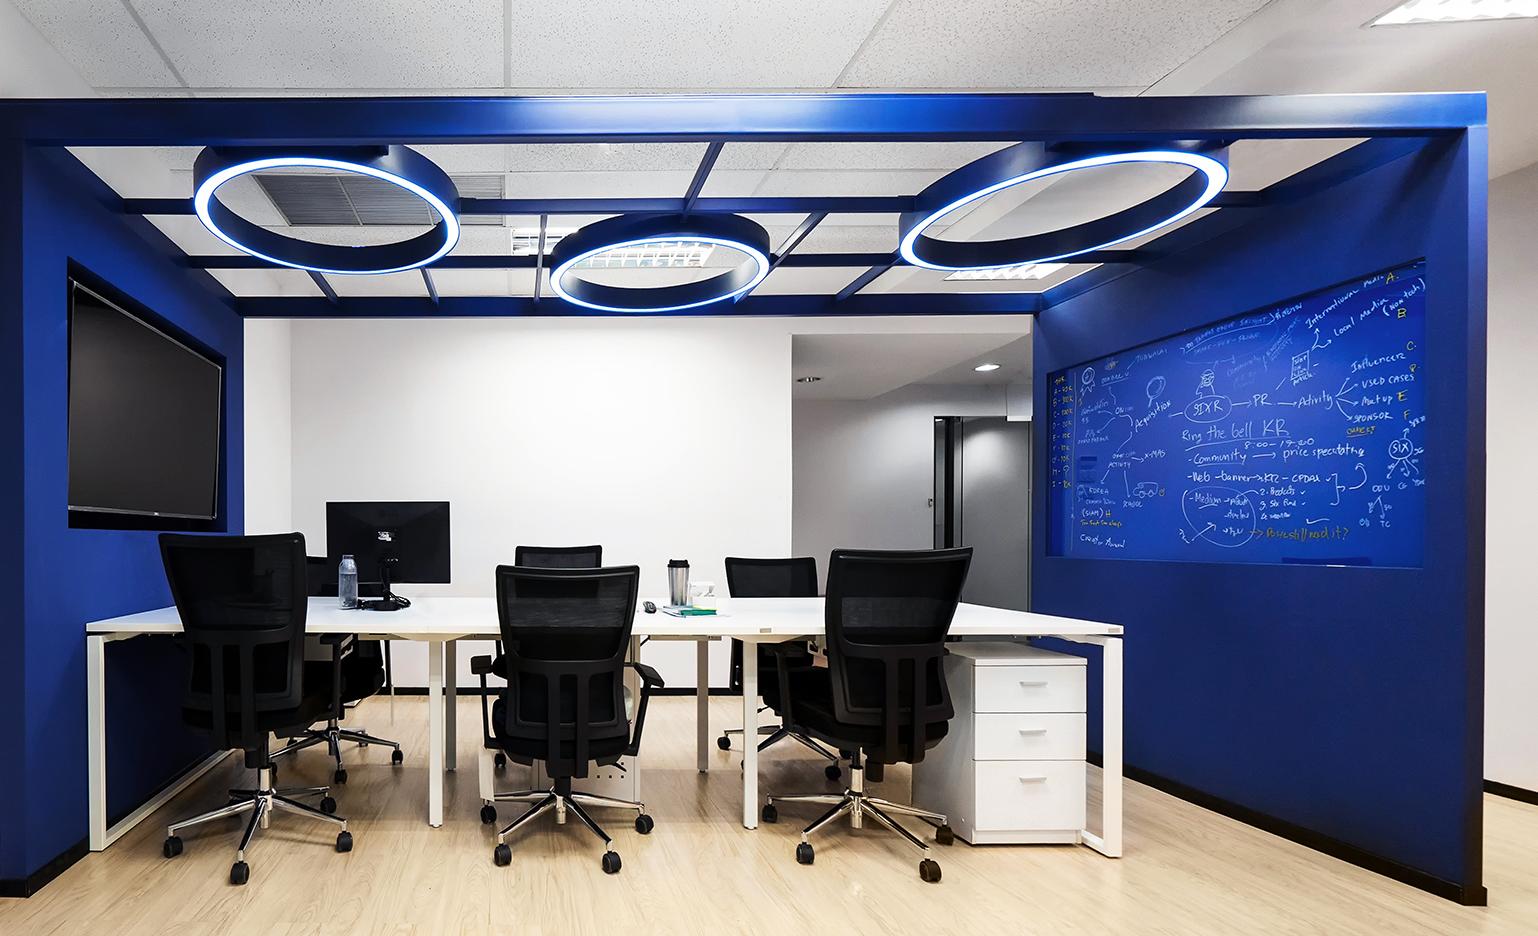 six network office 10 design 10